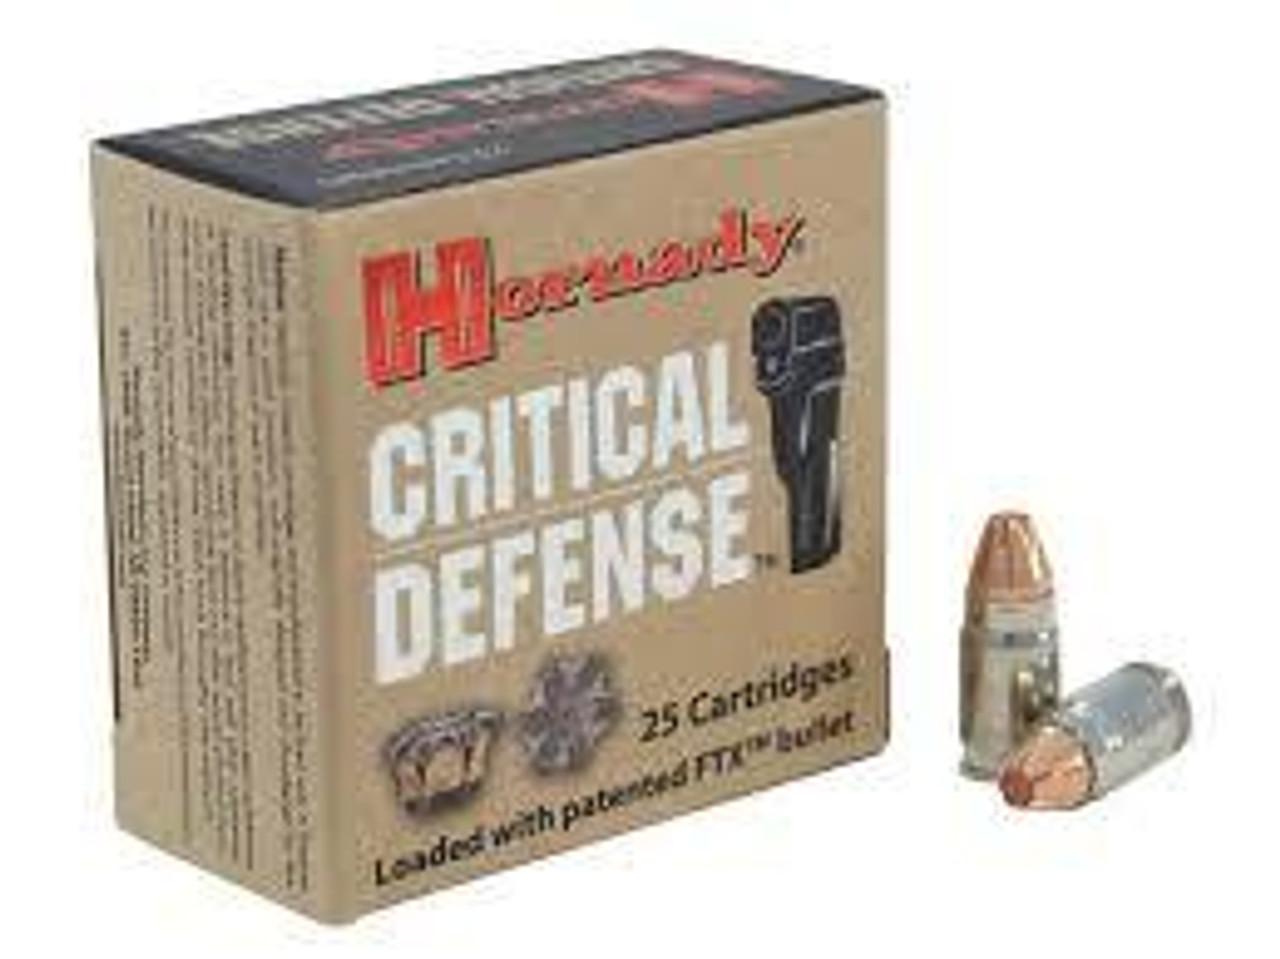 32 NAA Ammo